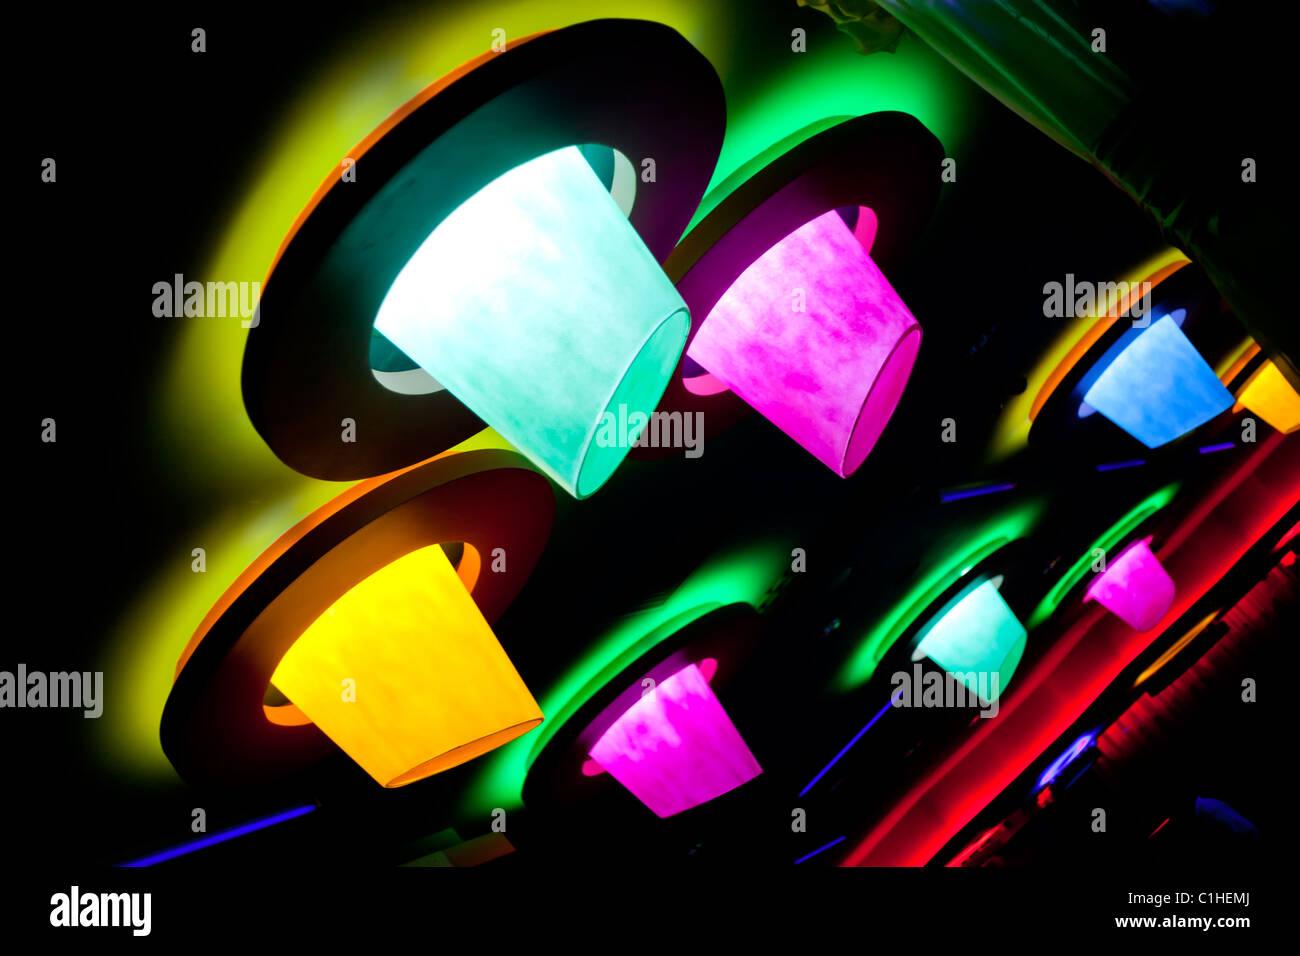 abstrakte Diskothek Beleuchtung mit Kreisen Stockbild